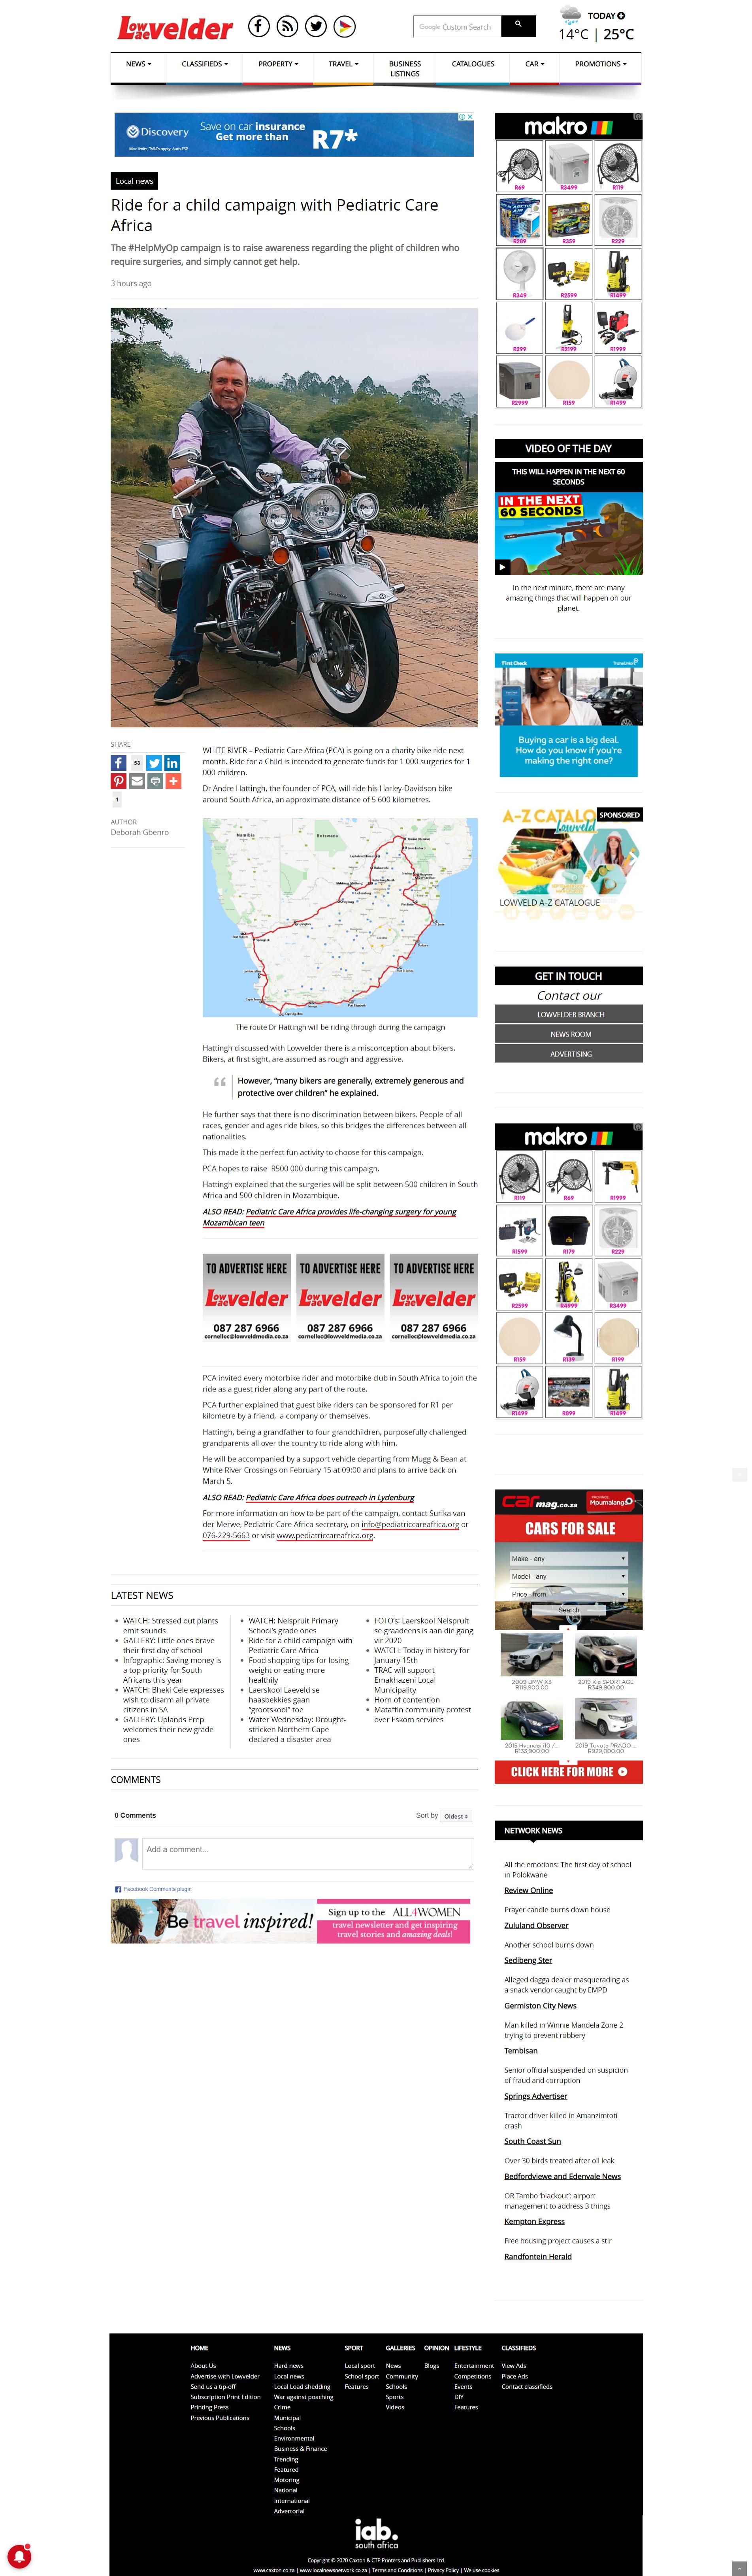 screencapture-lowvelder-co-za-520344-ride-child-campaign-pediatric-care-africa-2020-01-15-15_01_48